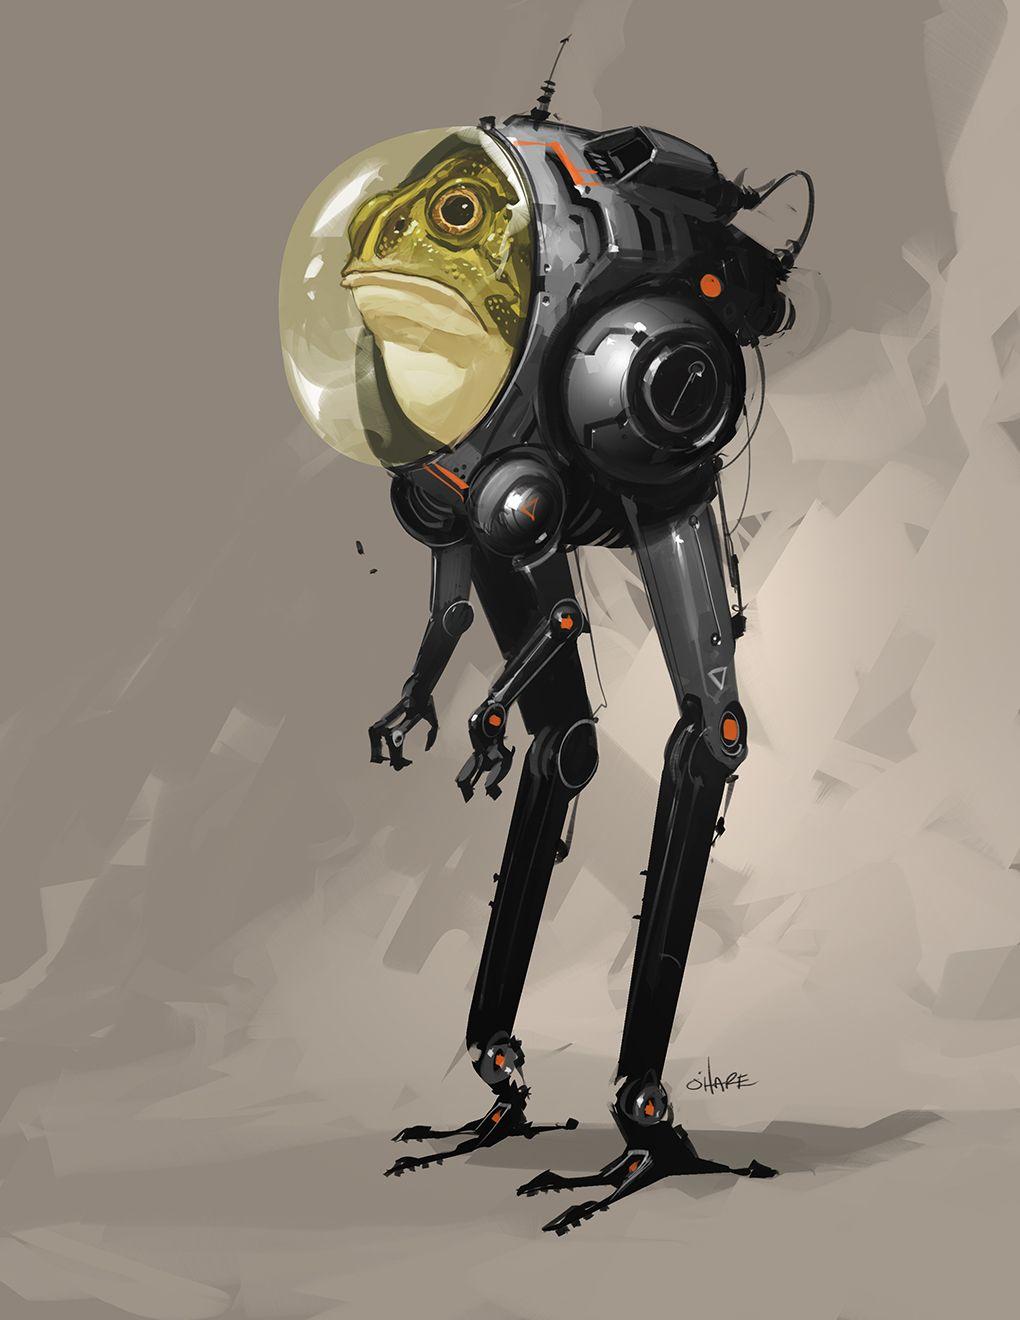 xenobot-quotrobot-hidup-pertamaquot-dari-sel-hidup